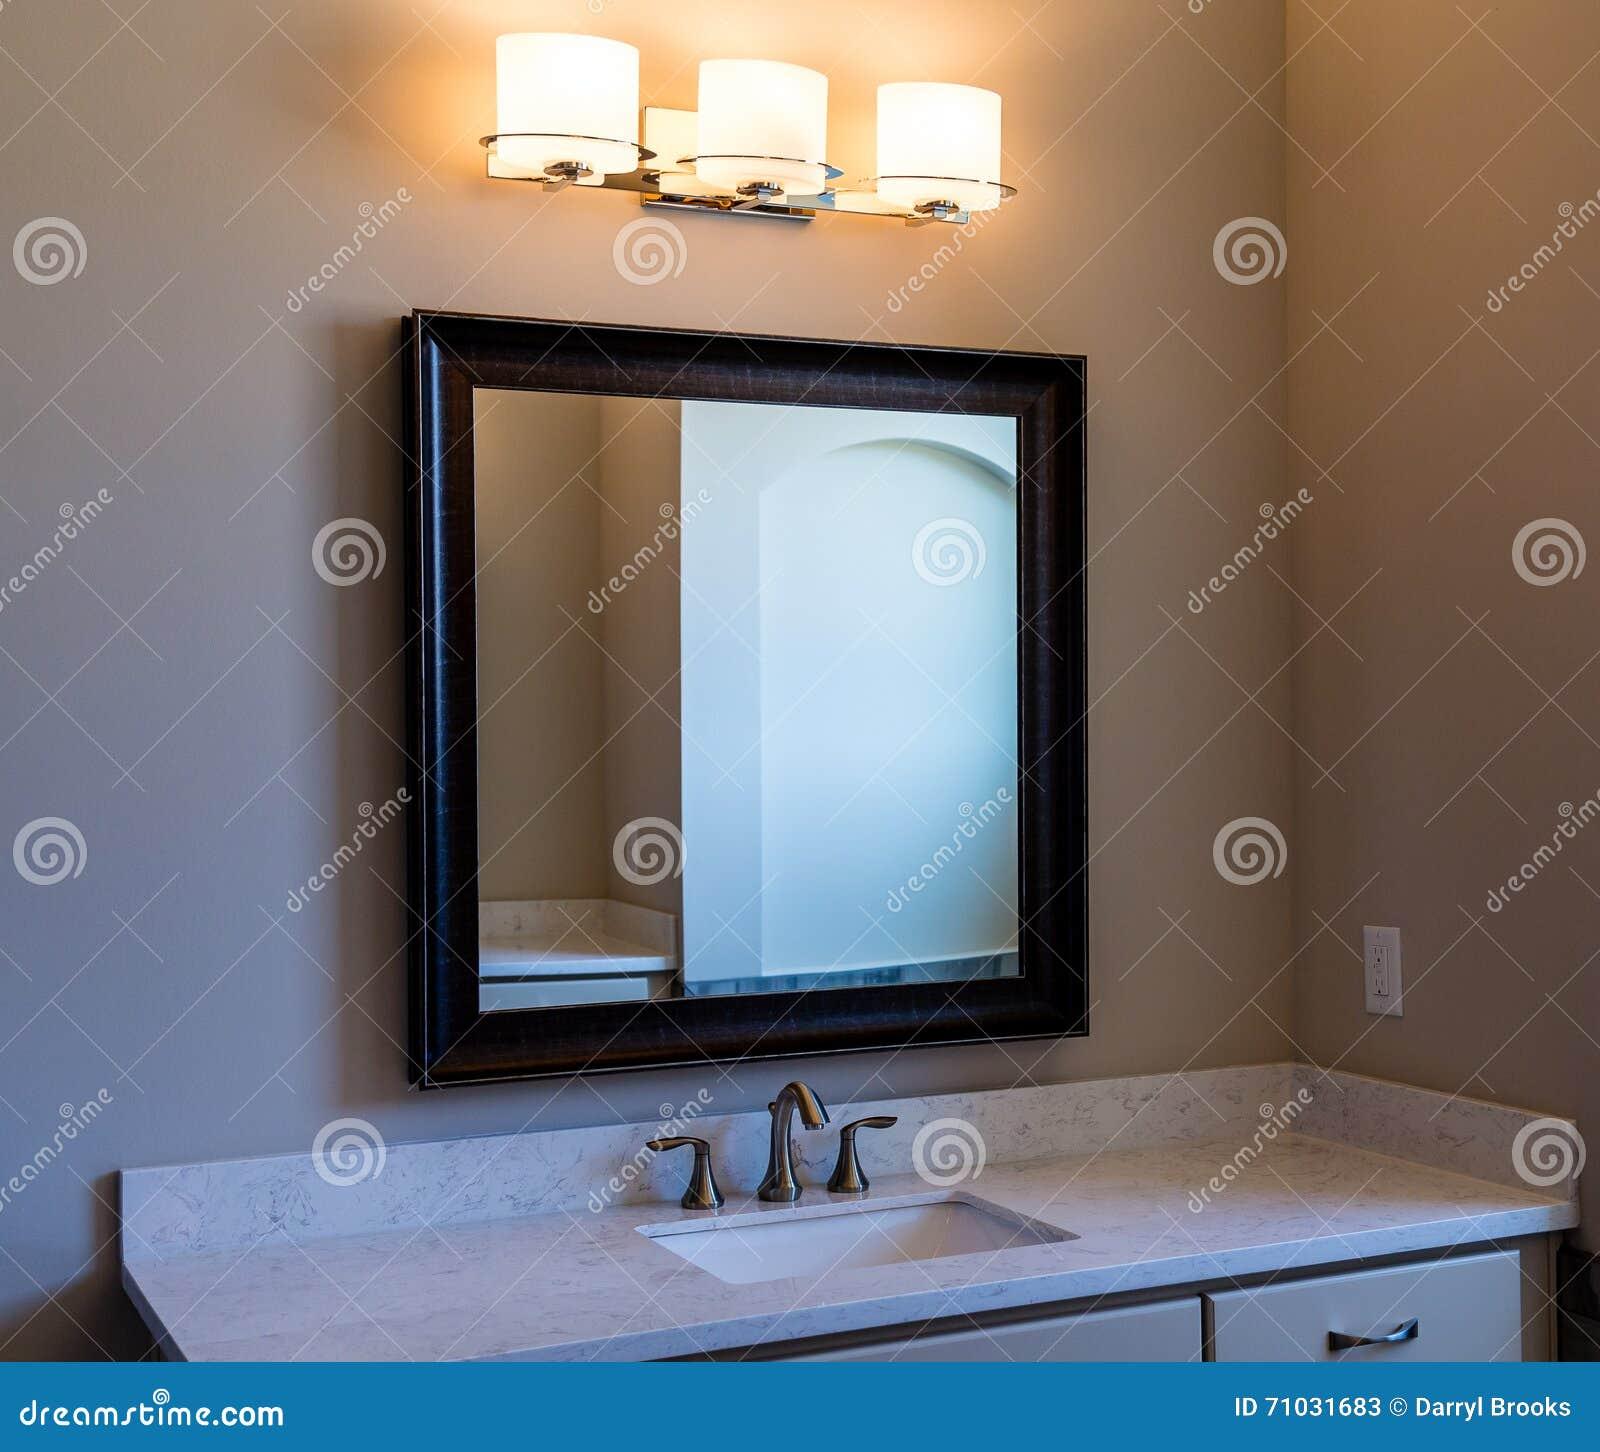 Modern Bathroom Vanity Mirror And Lights Stock Image Image Of Bath